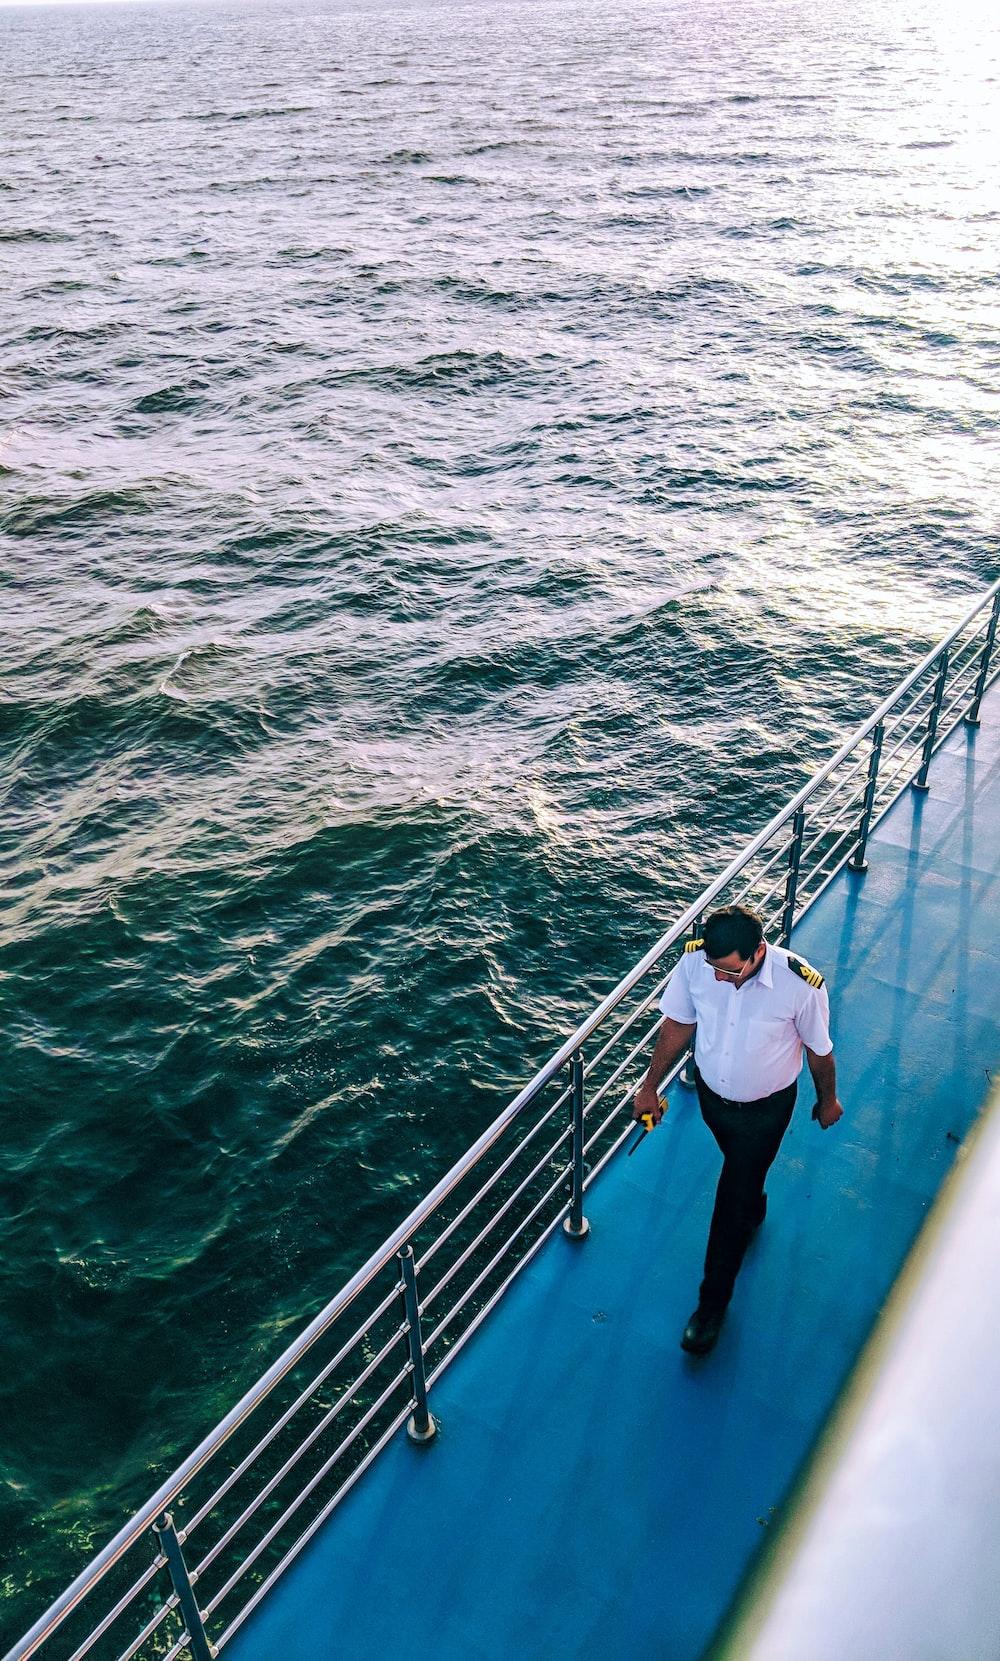 man walking on blue boat surface